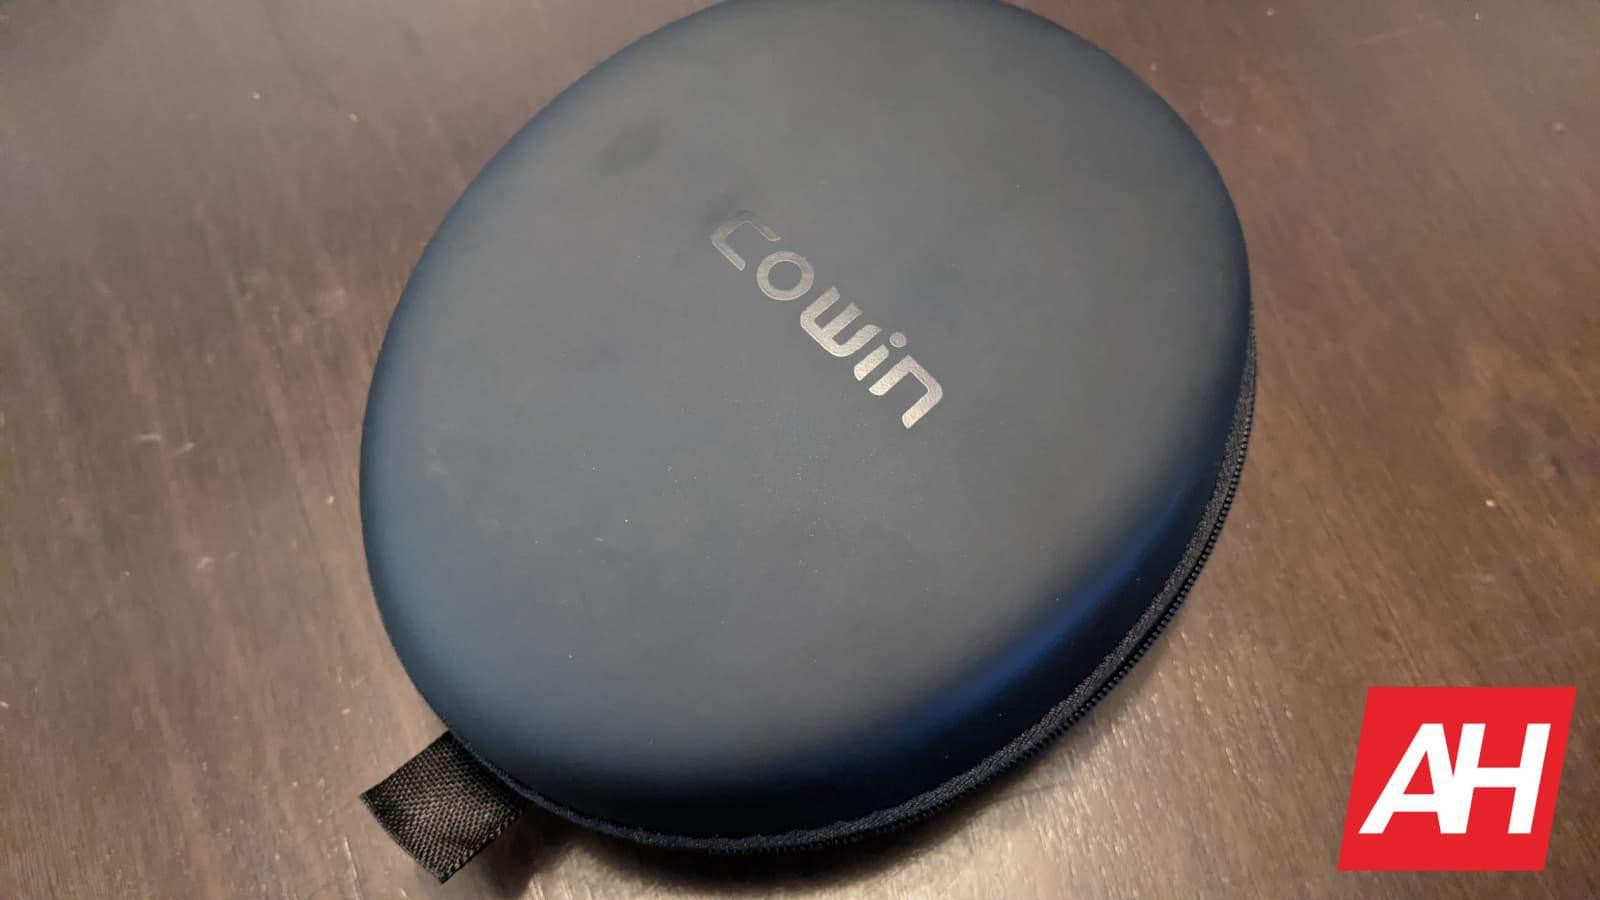 Cowin SE7 Review 9